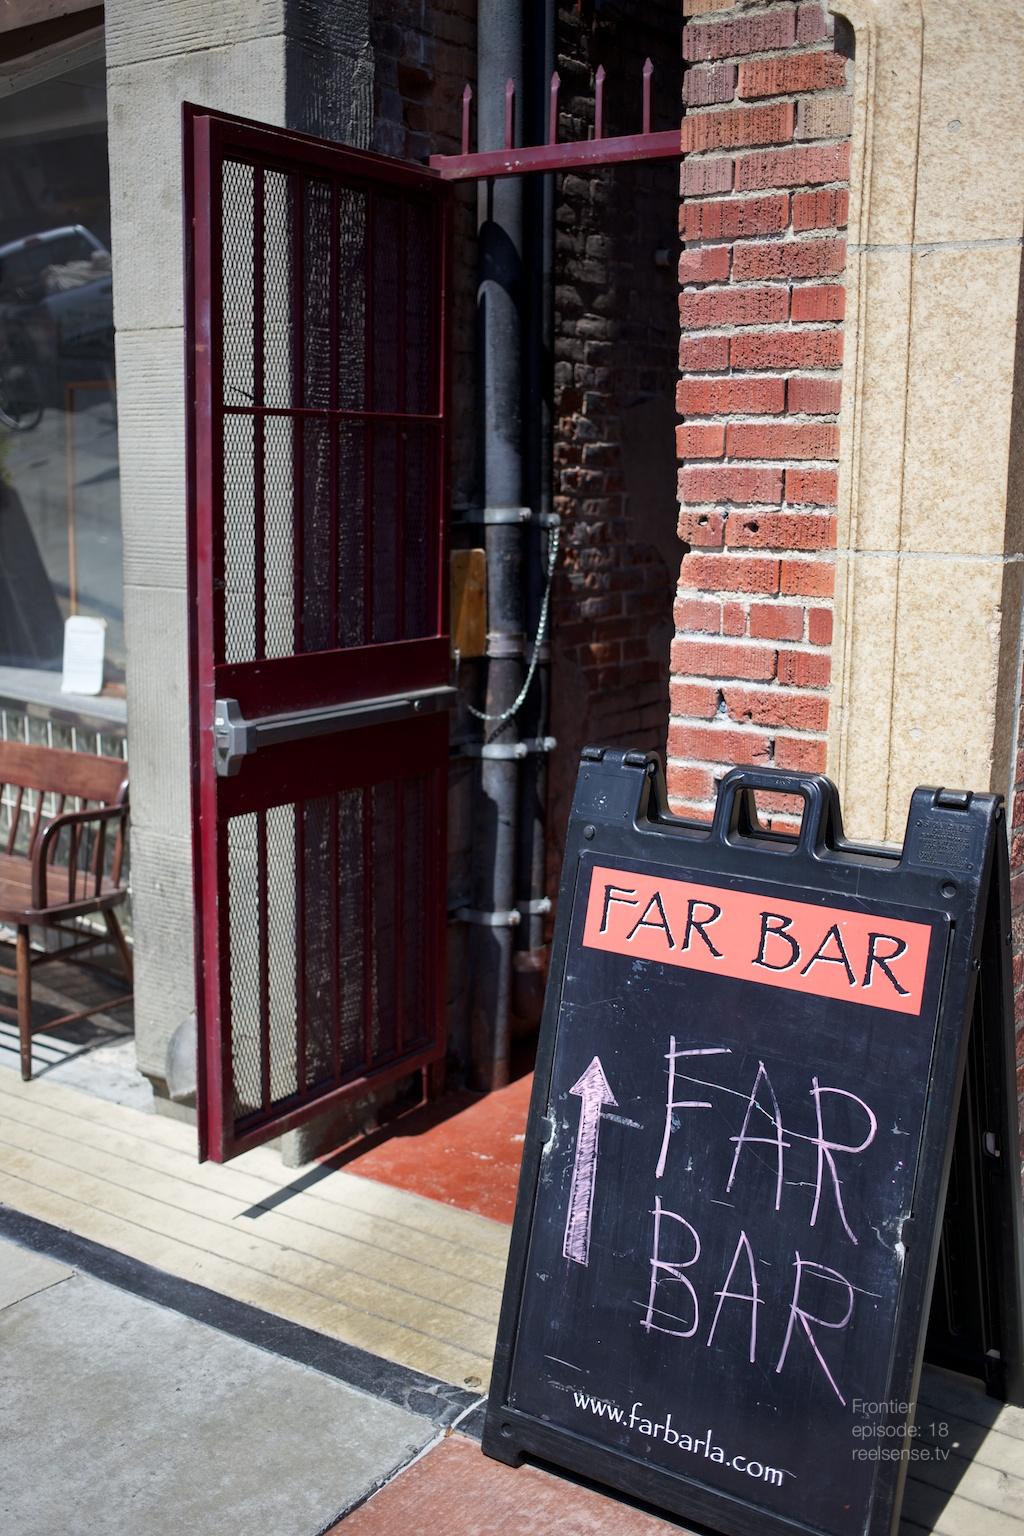 Little Tokyo - Far bar - Entrance between buildings